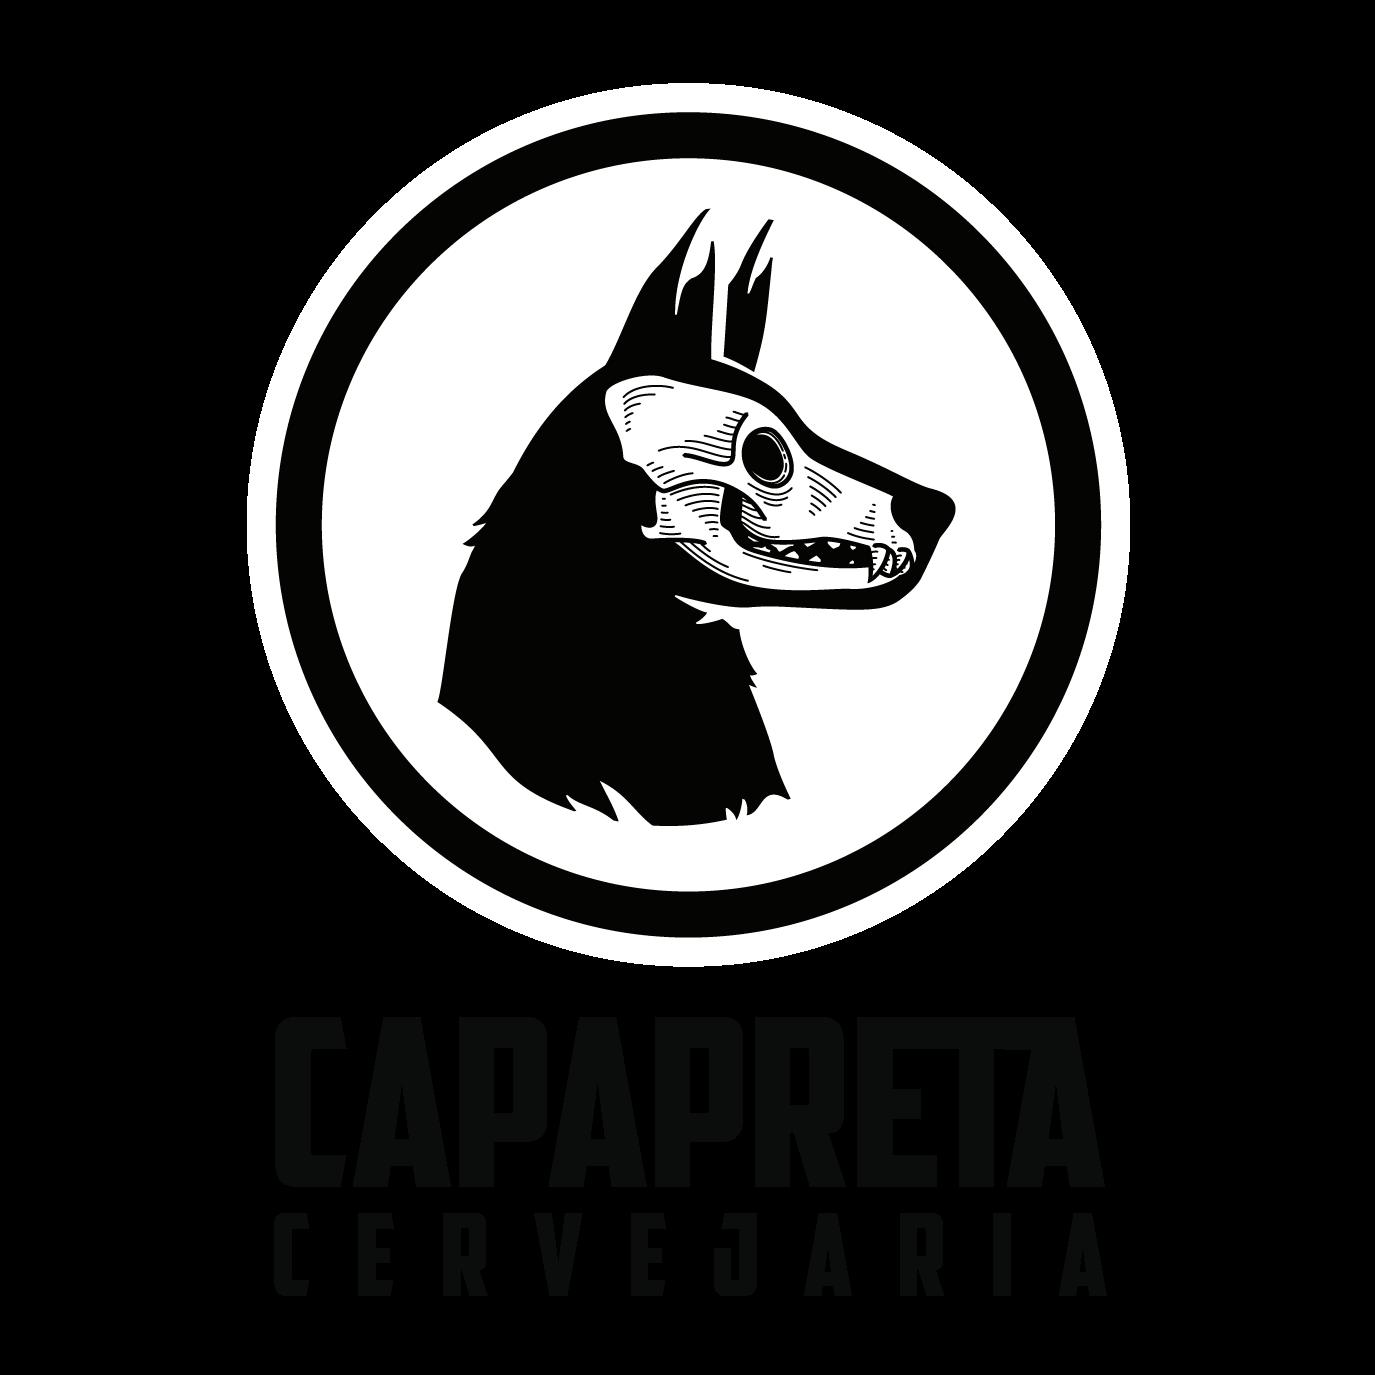 2_-_capapreta-preto